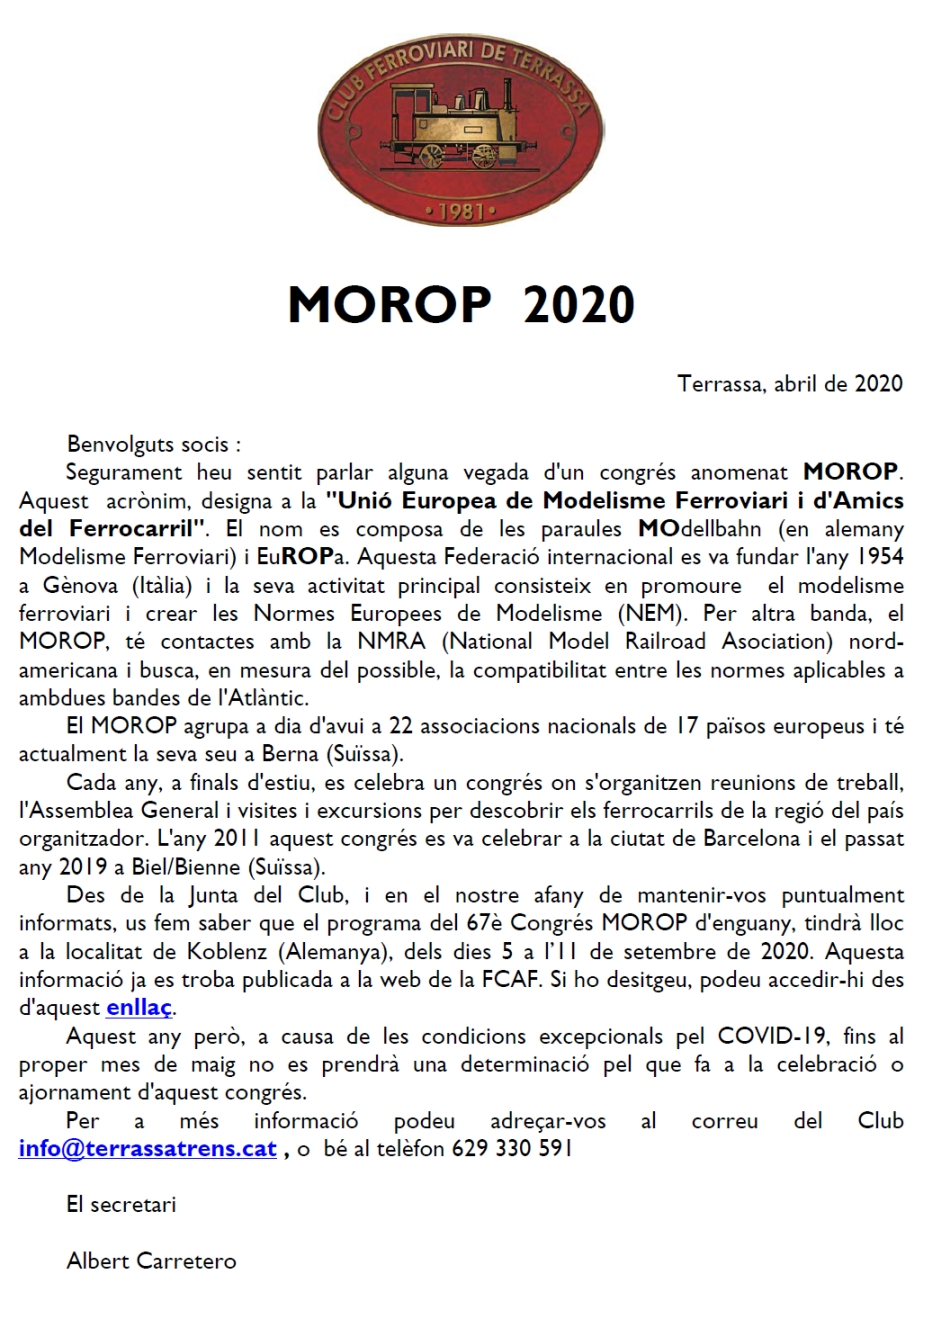 MOROP 2020